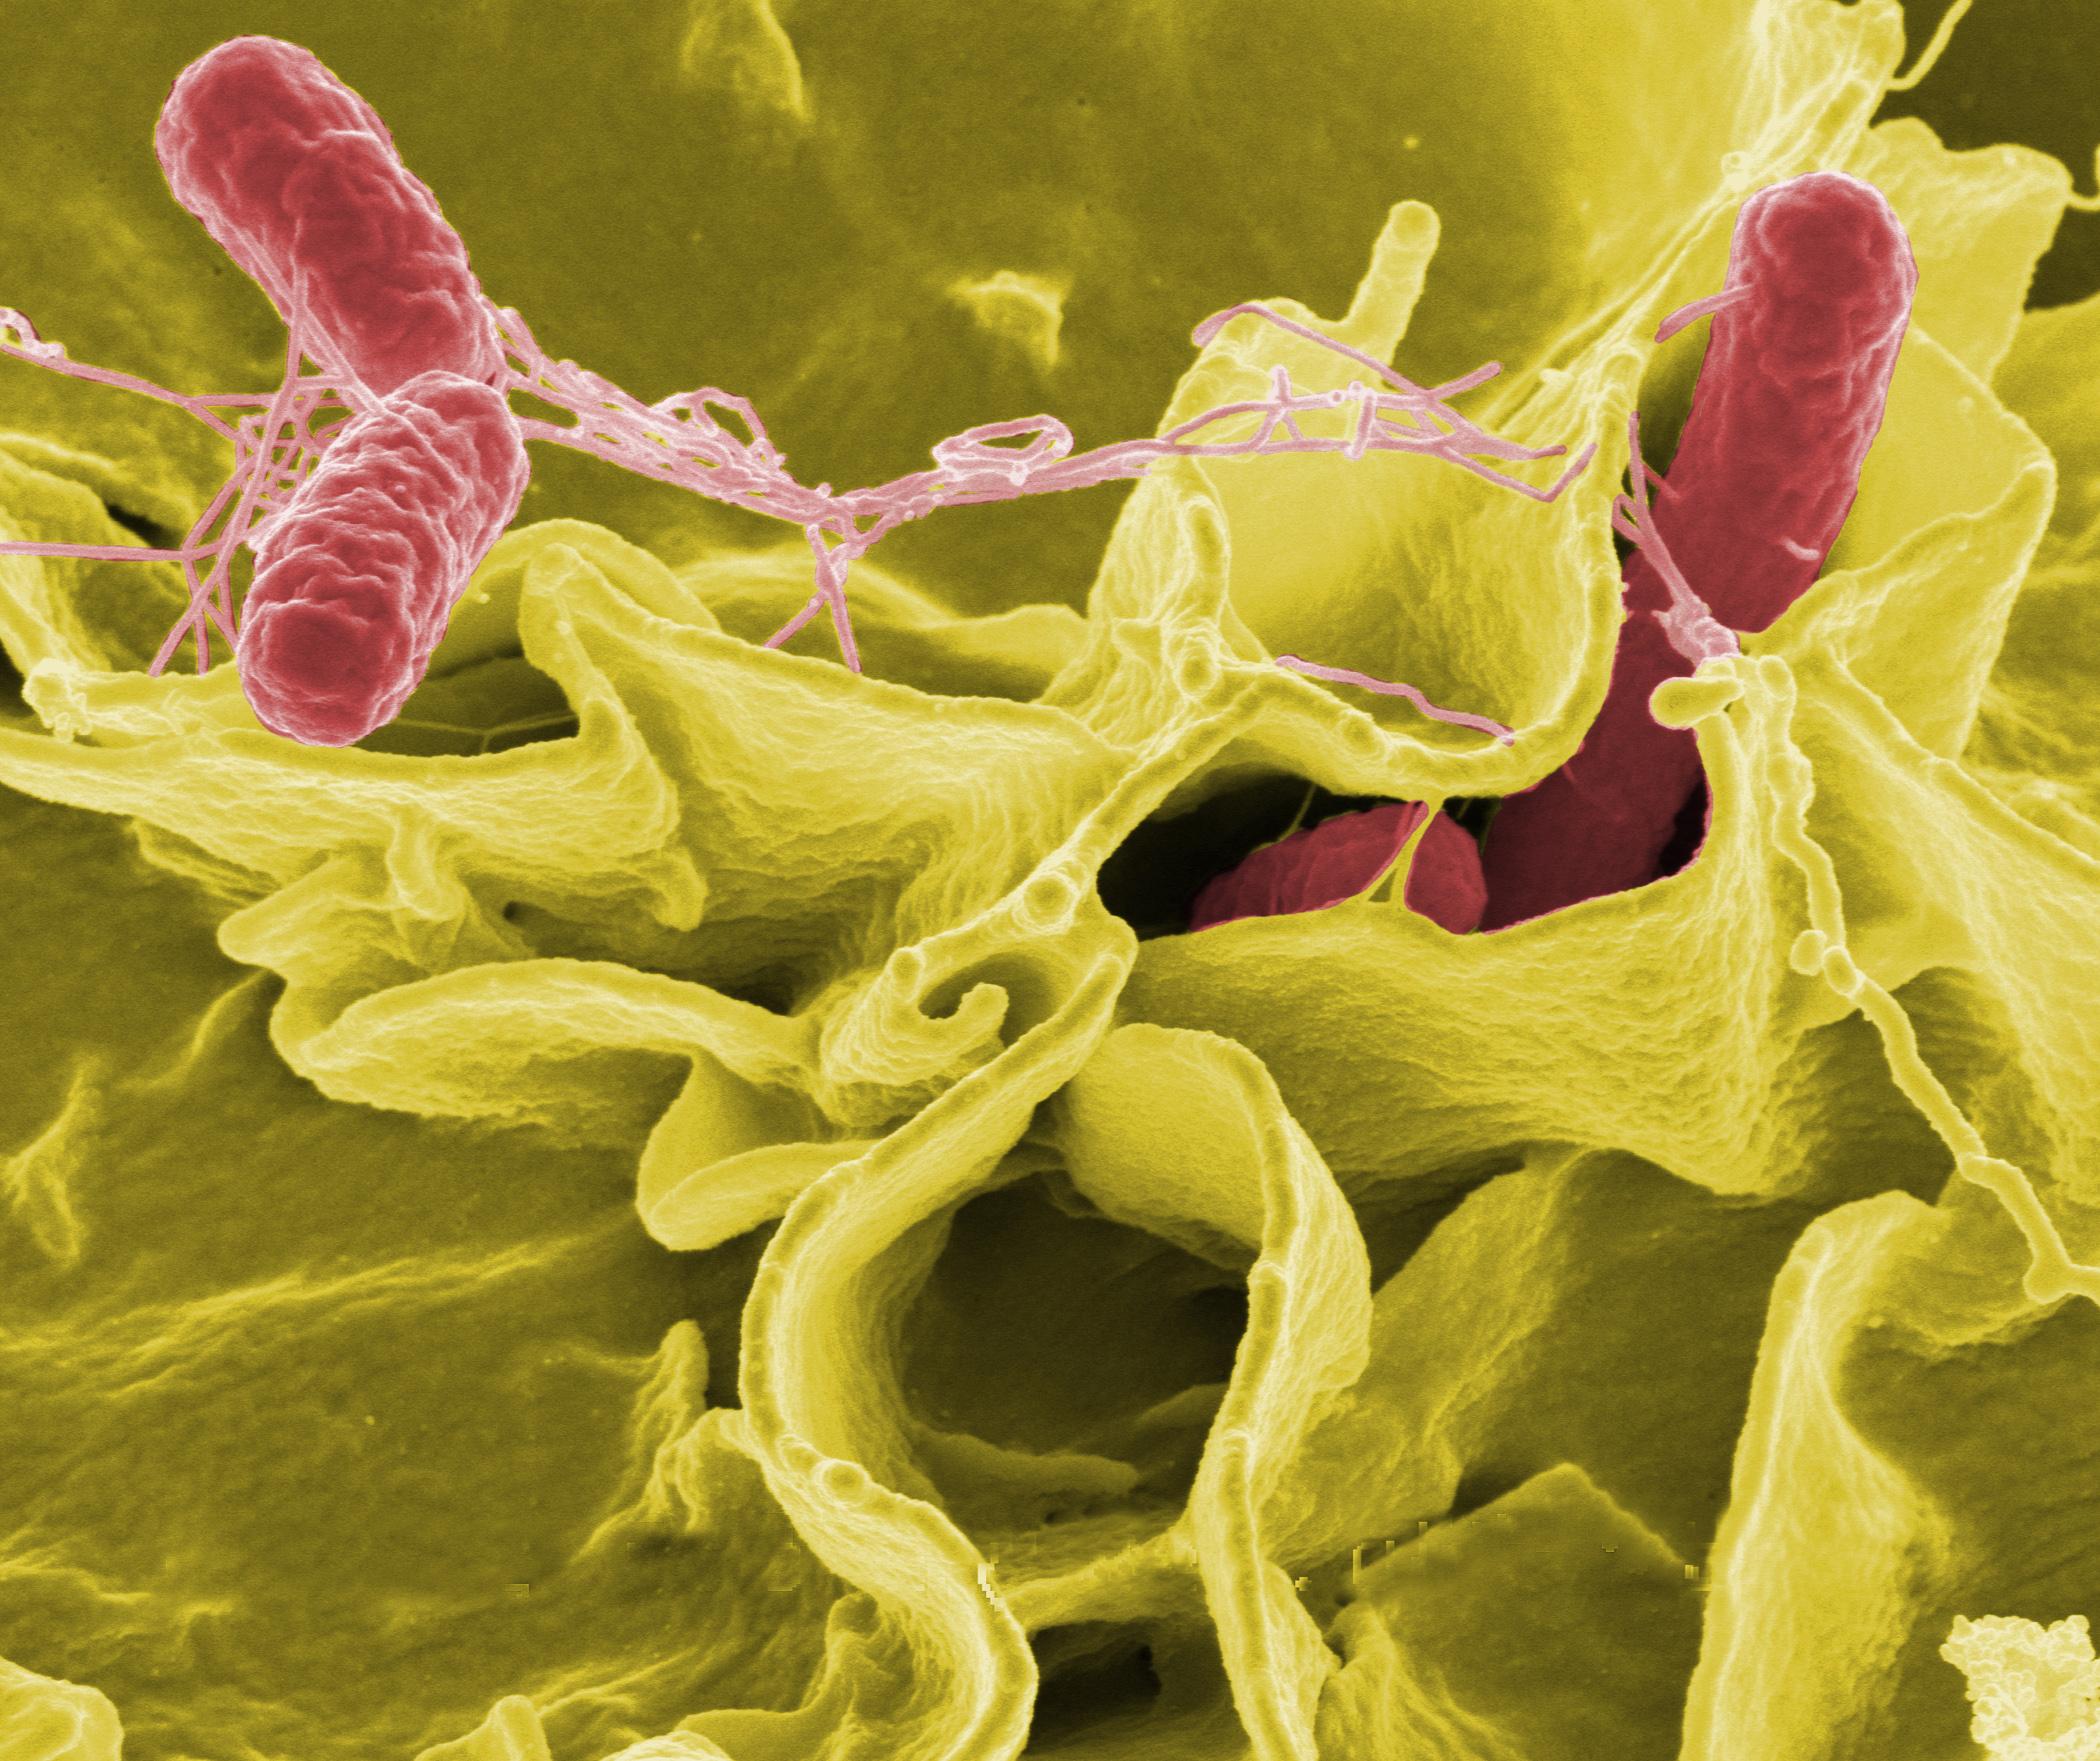 Enteritis Salmonella